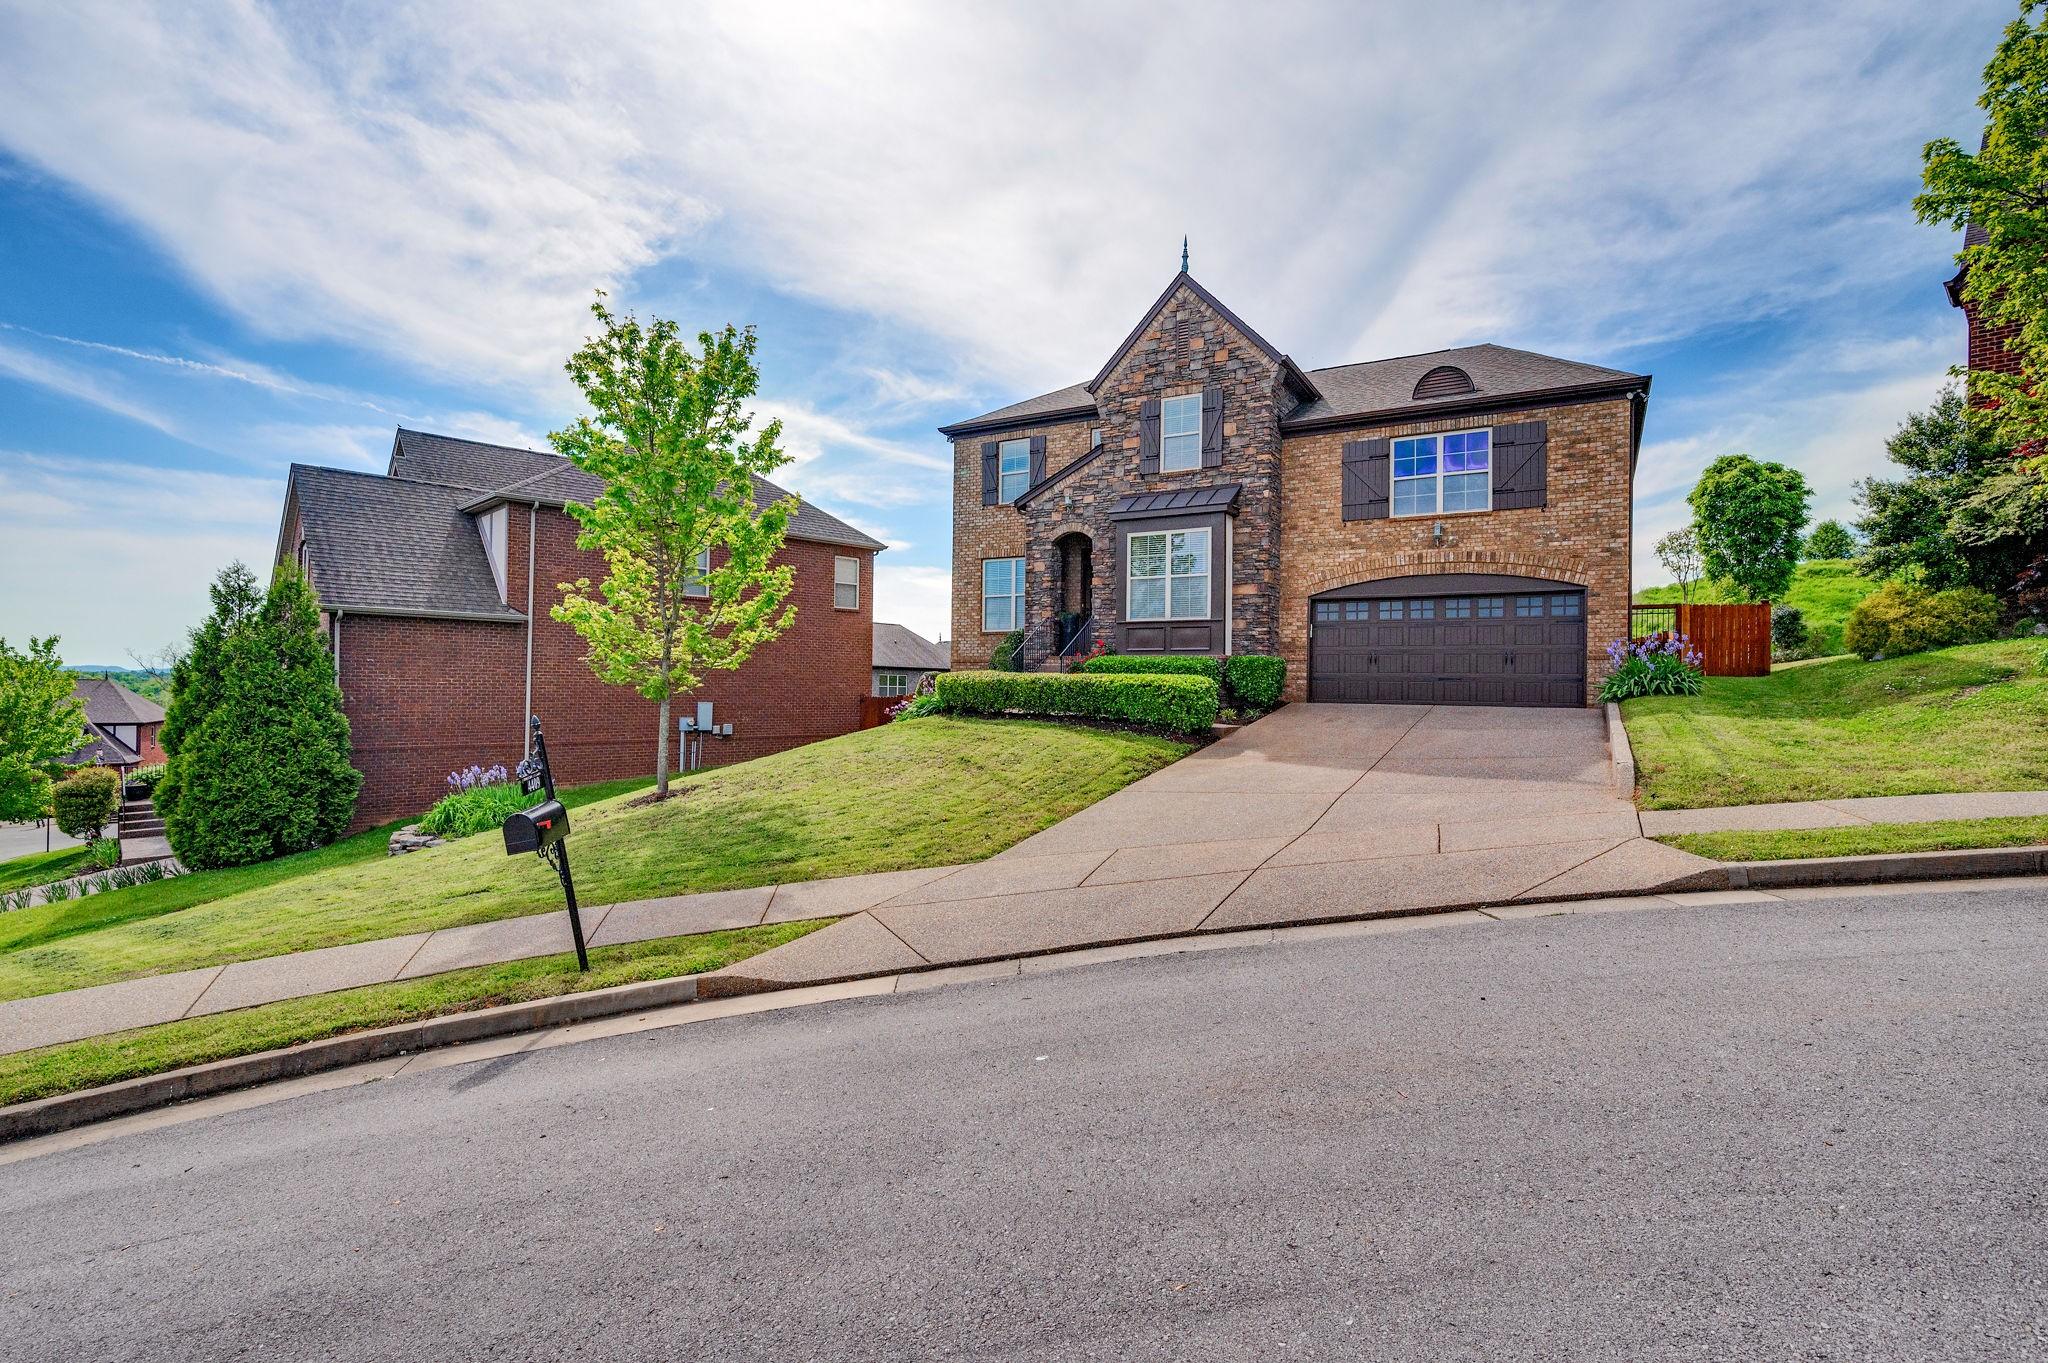 4409 Birdseye Ct Property Photo - Hermitage, TN real estate listing